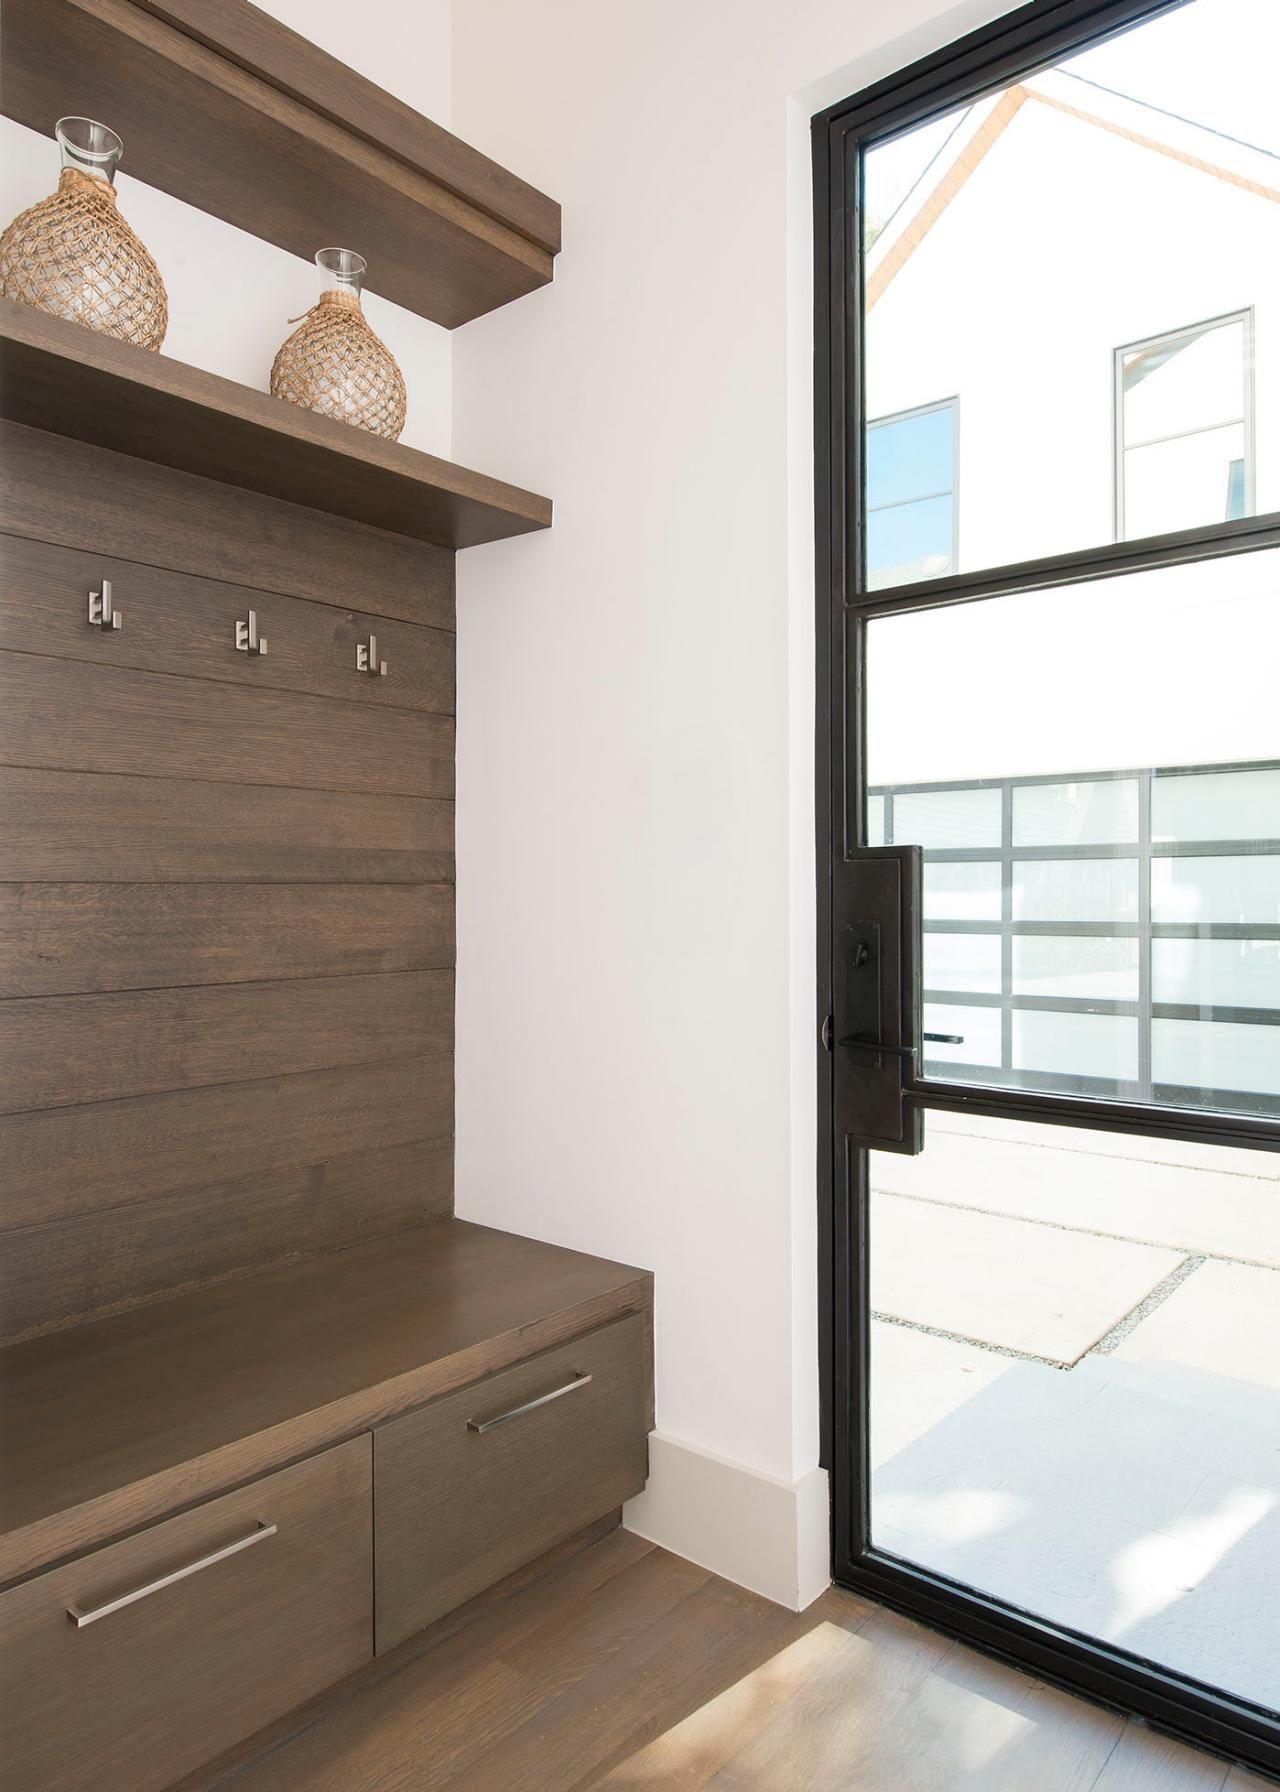 Mudroom Photos Hgtv Modern Mud Room With Oak Bench. home decor ...